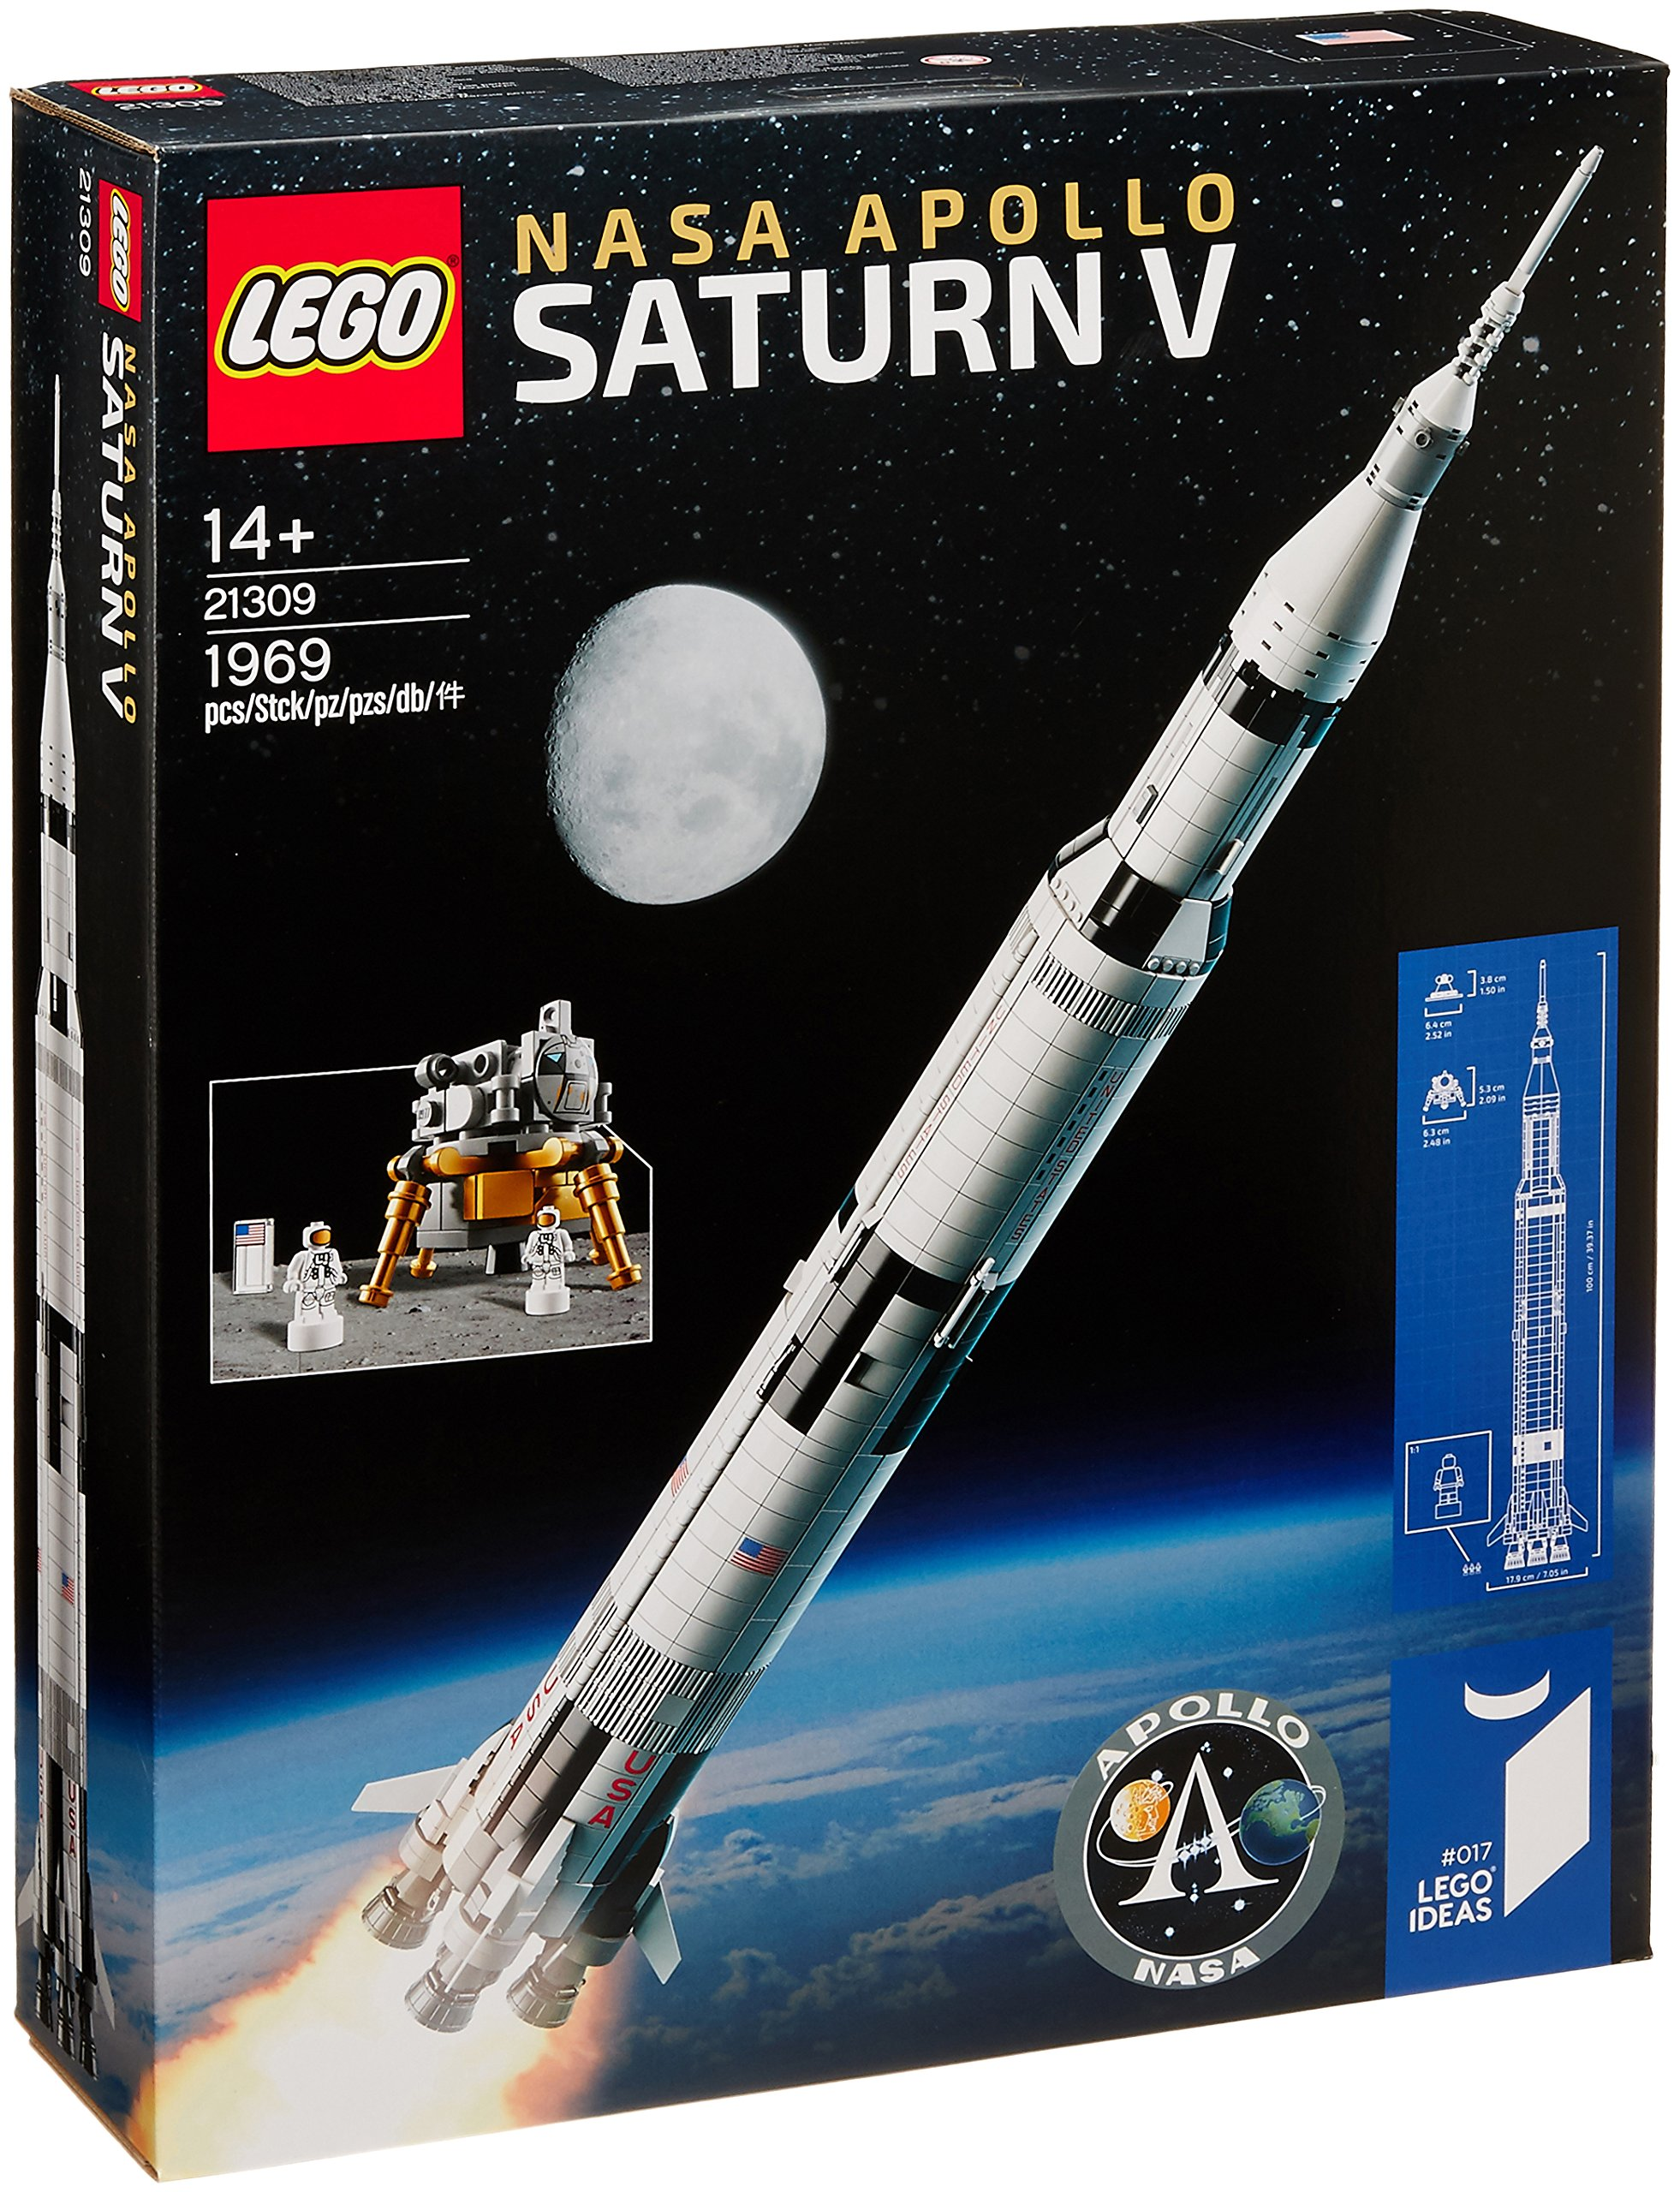 LEGO Saturn V 21309 LEGO Ideas Nasa Apollo Saturn V 21309 Building Kit (1969 Piece) age 14 years and up